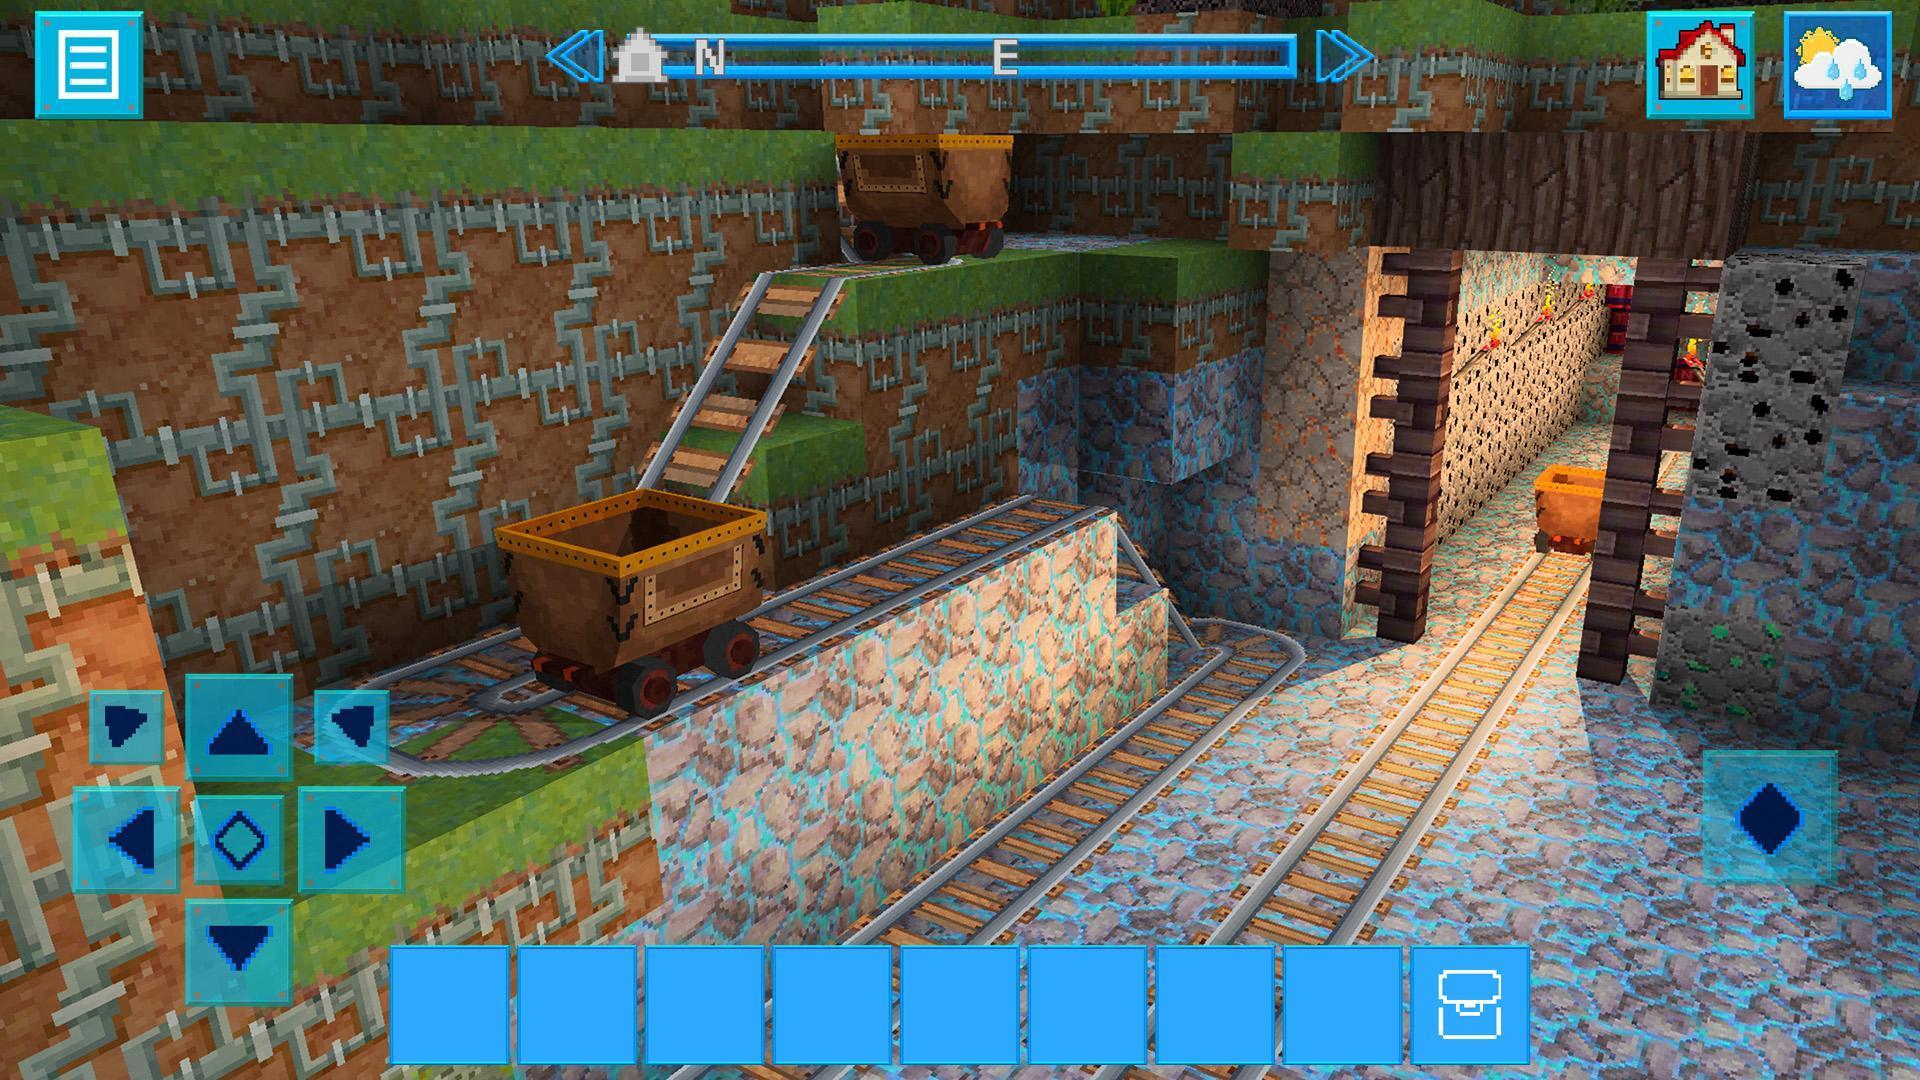 RoboCraft Building & Survival Craft - Robot World 5.0.5 Screenshot 12